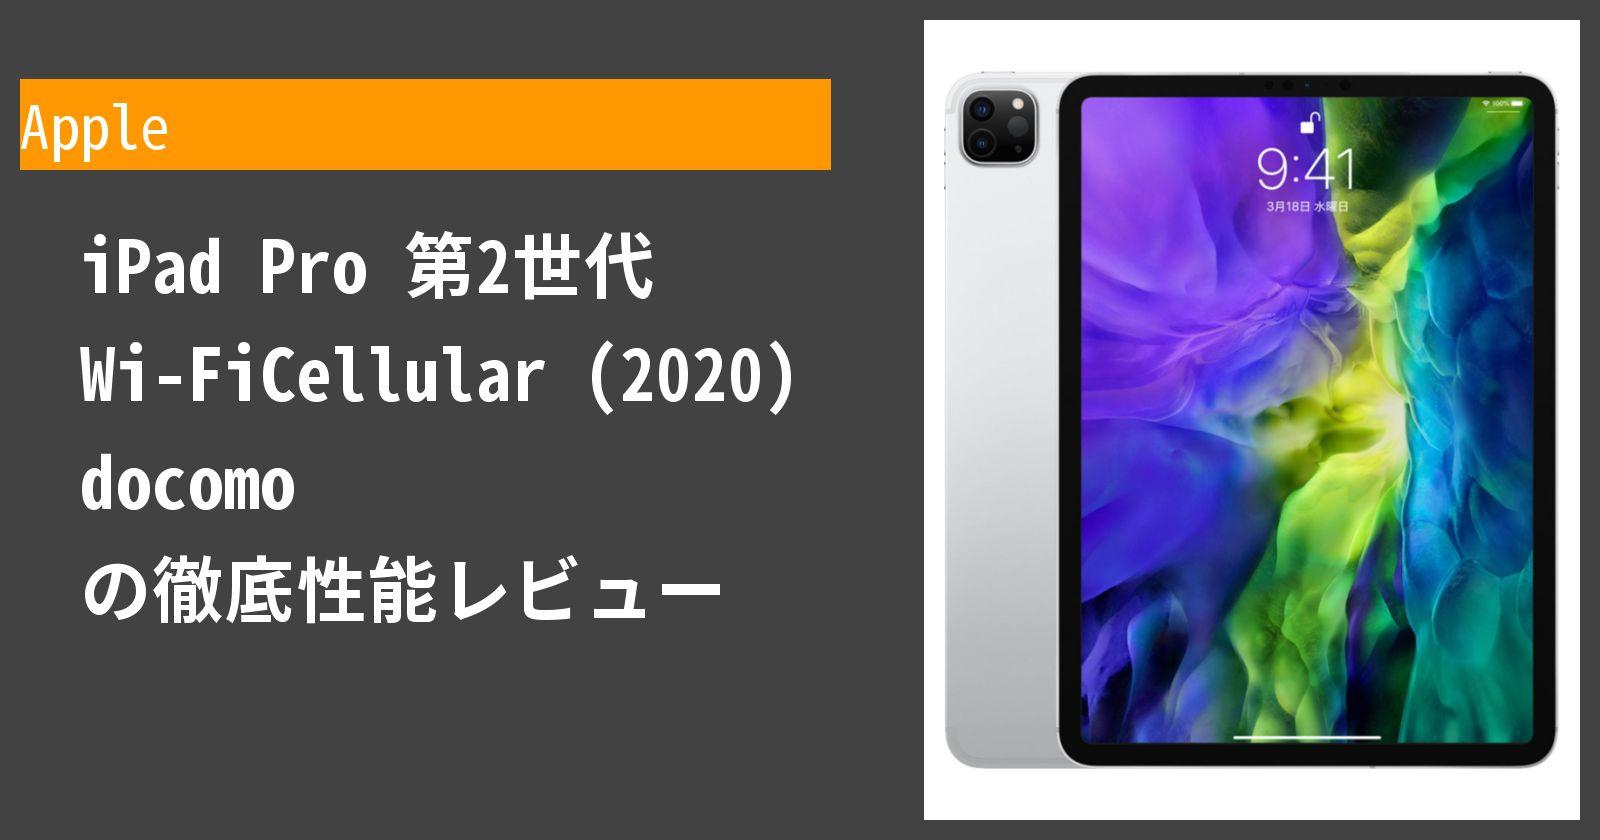 iPad Pro 第2世代 Wi-FiCellular (2020) docomo の徹底性能レビュー